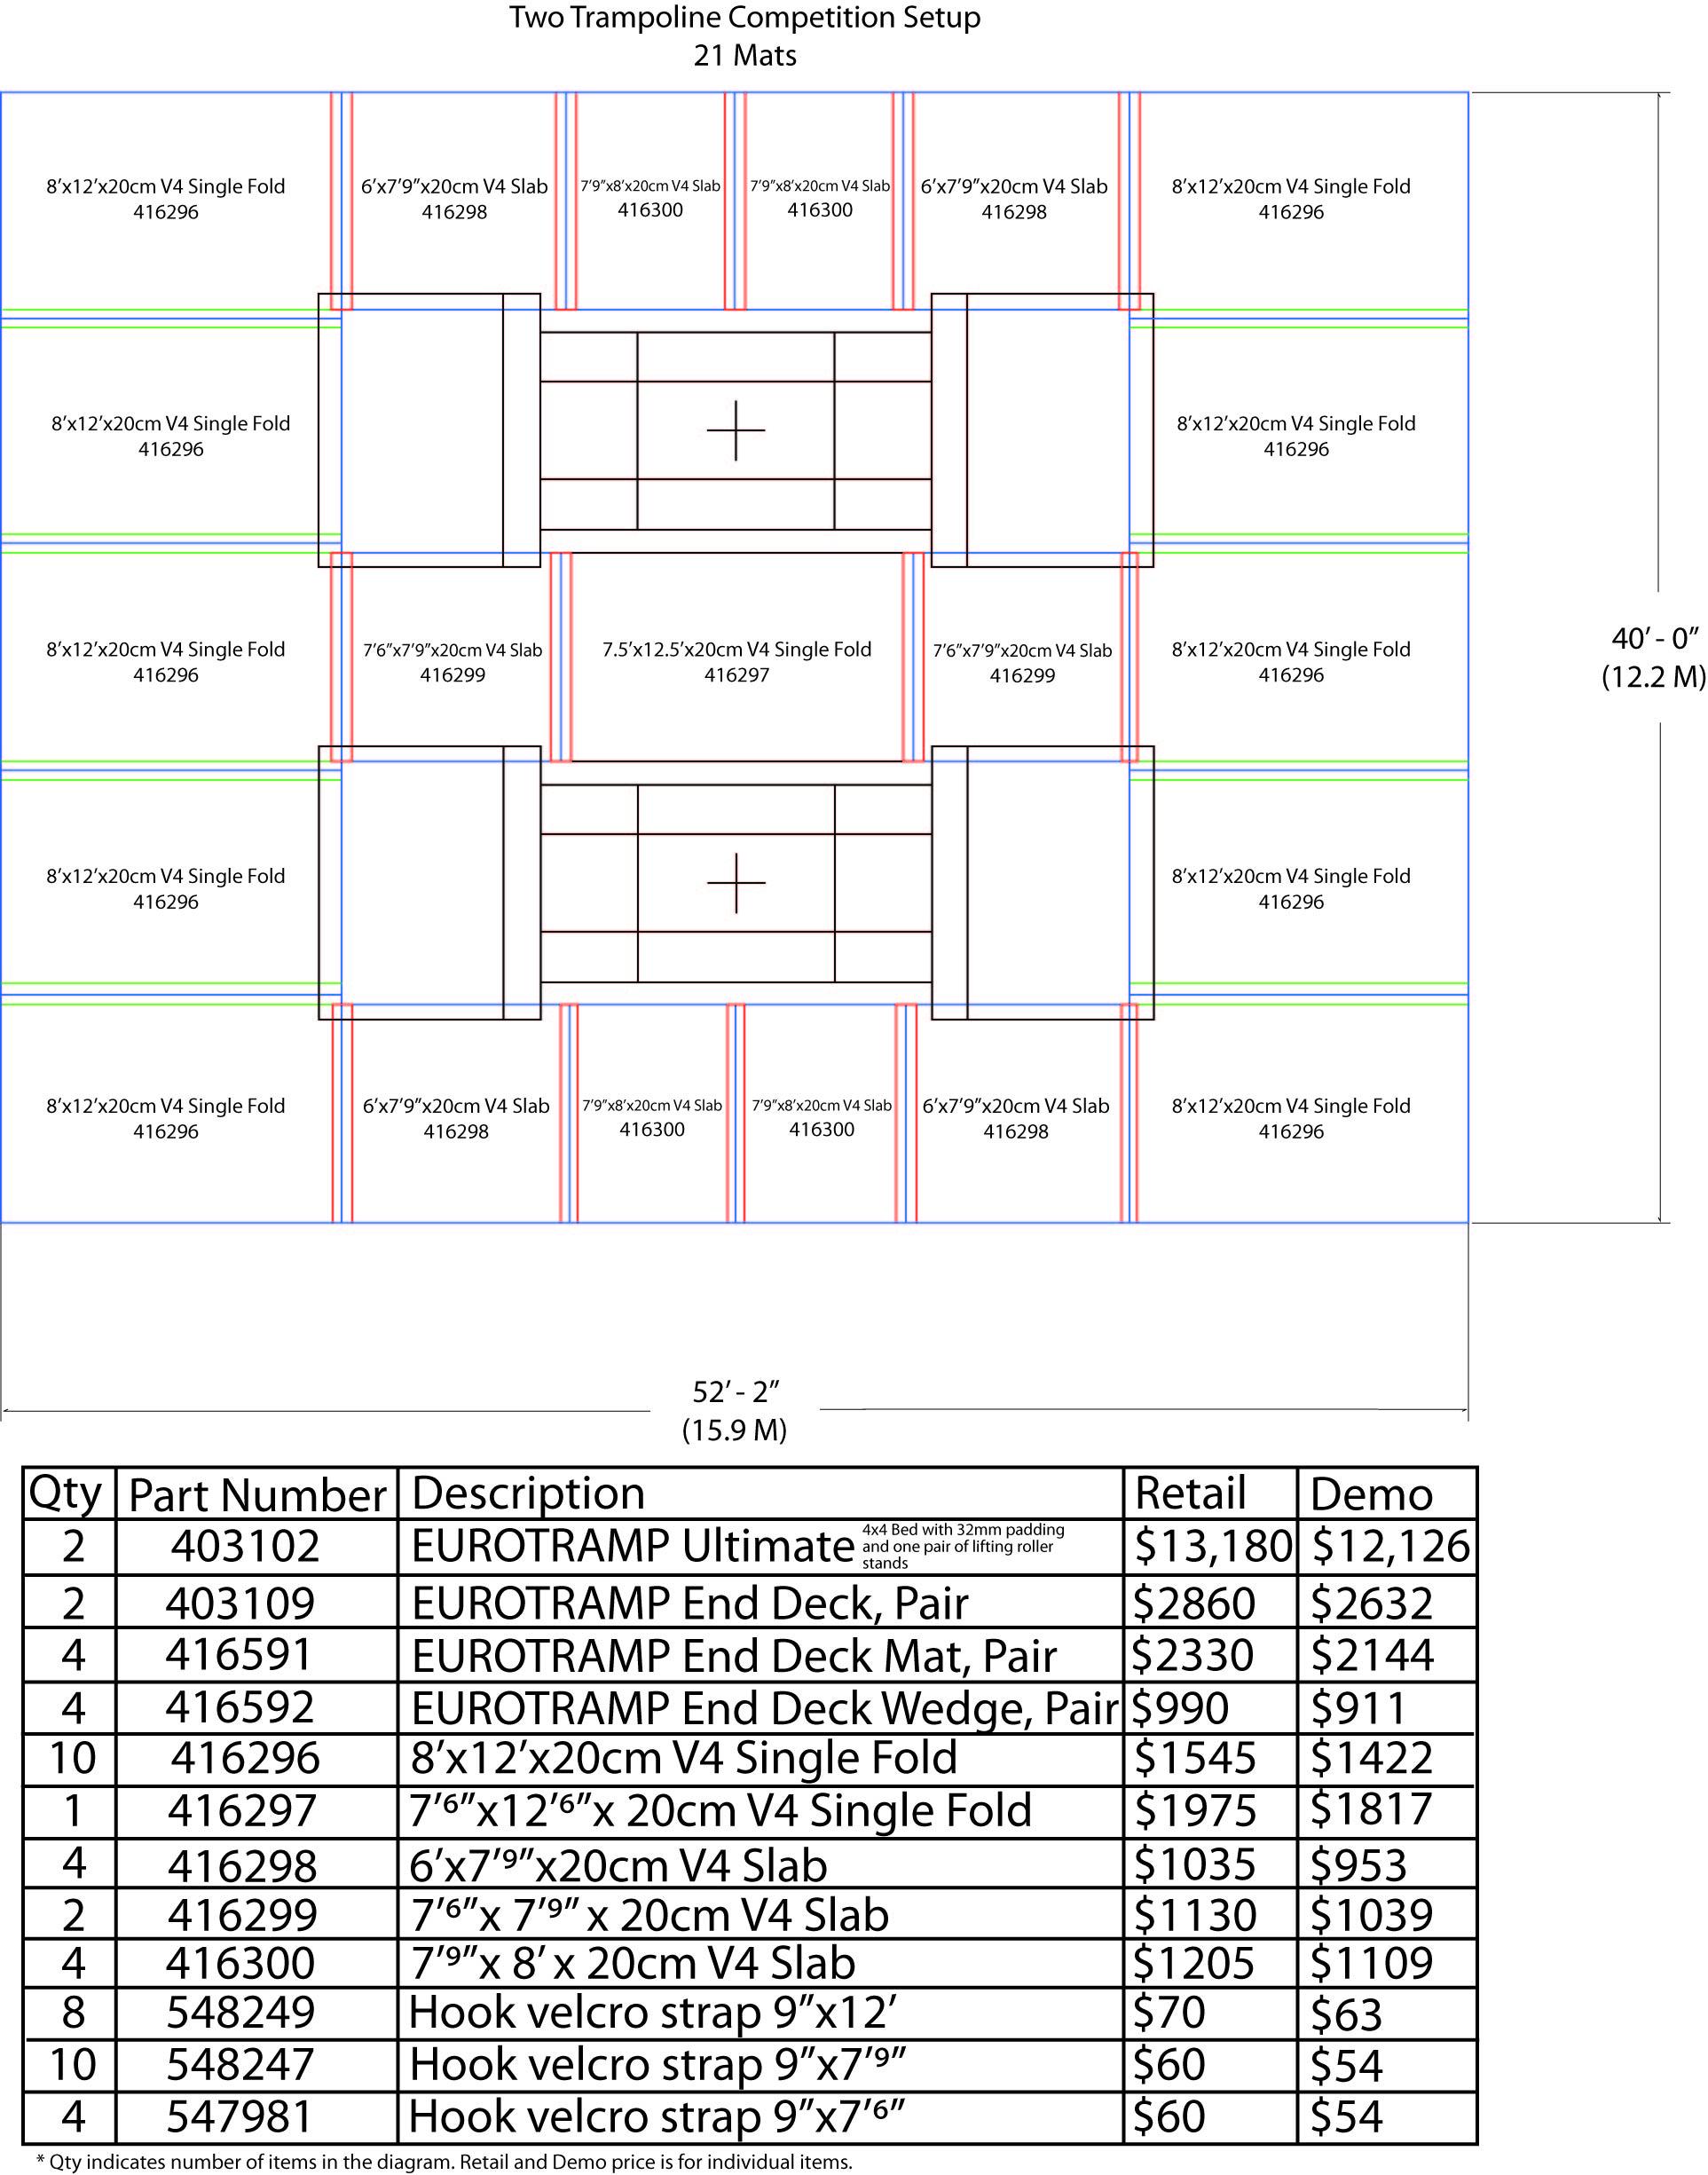 21-mat-2-trampoline-layout..jpg